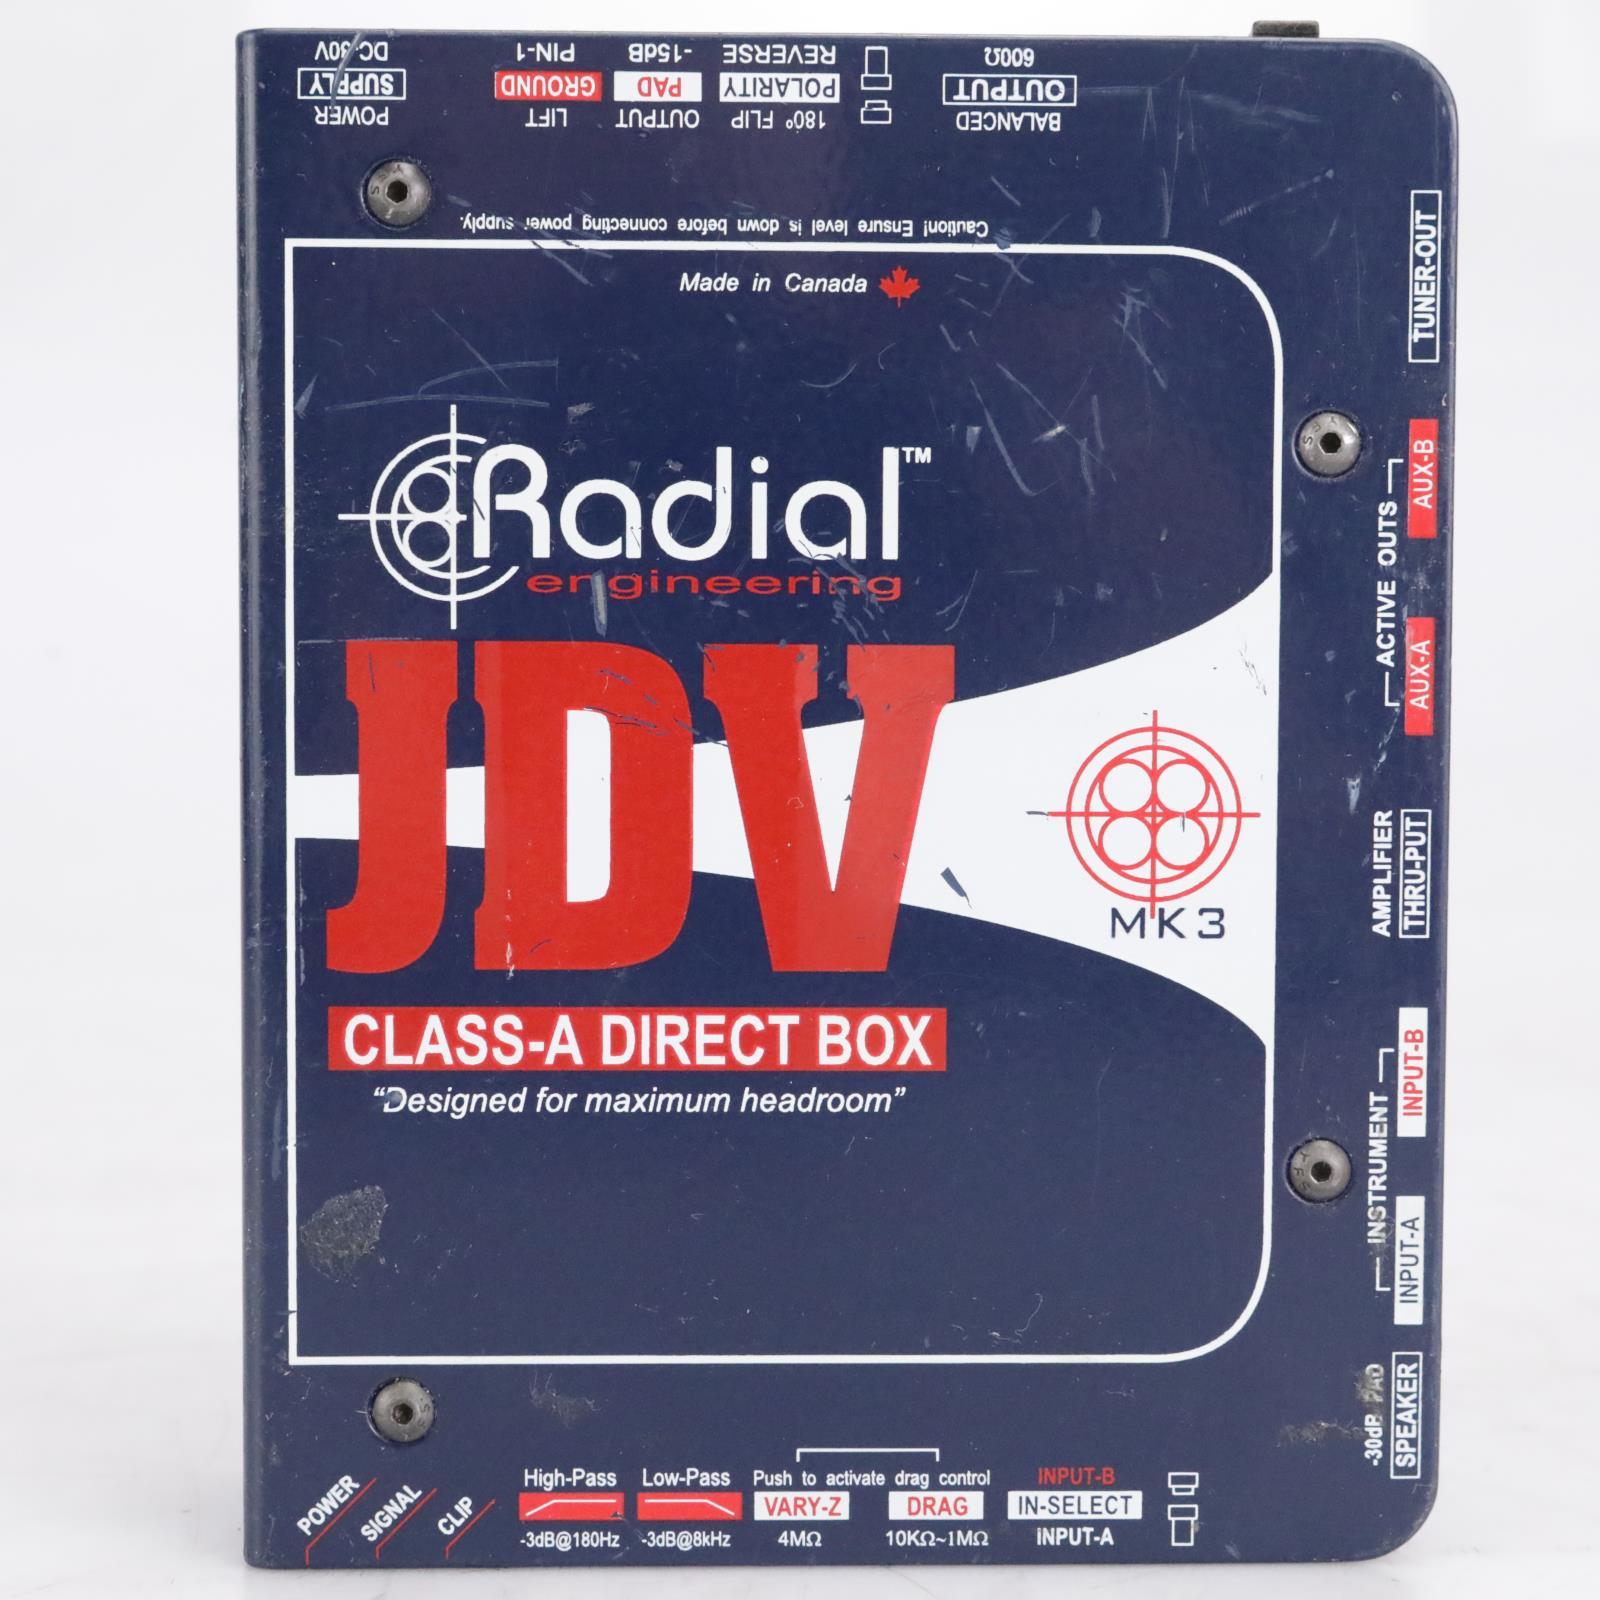 Radial Engineering JDV Class-A MK3 Direct Box #42545